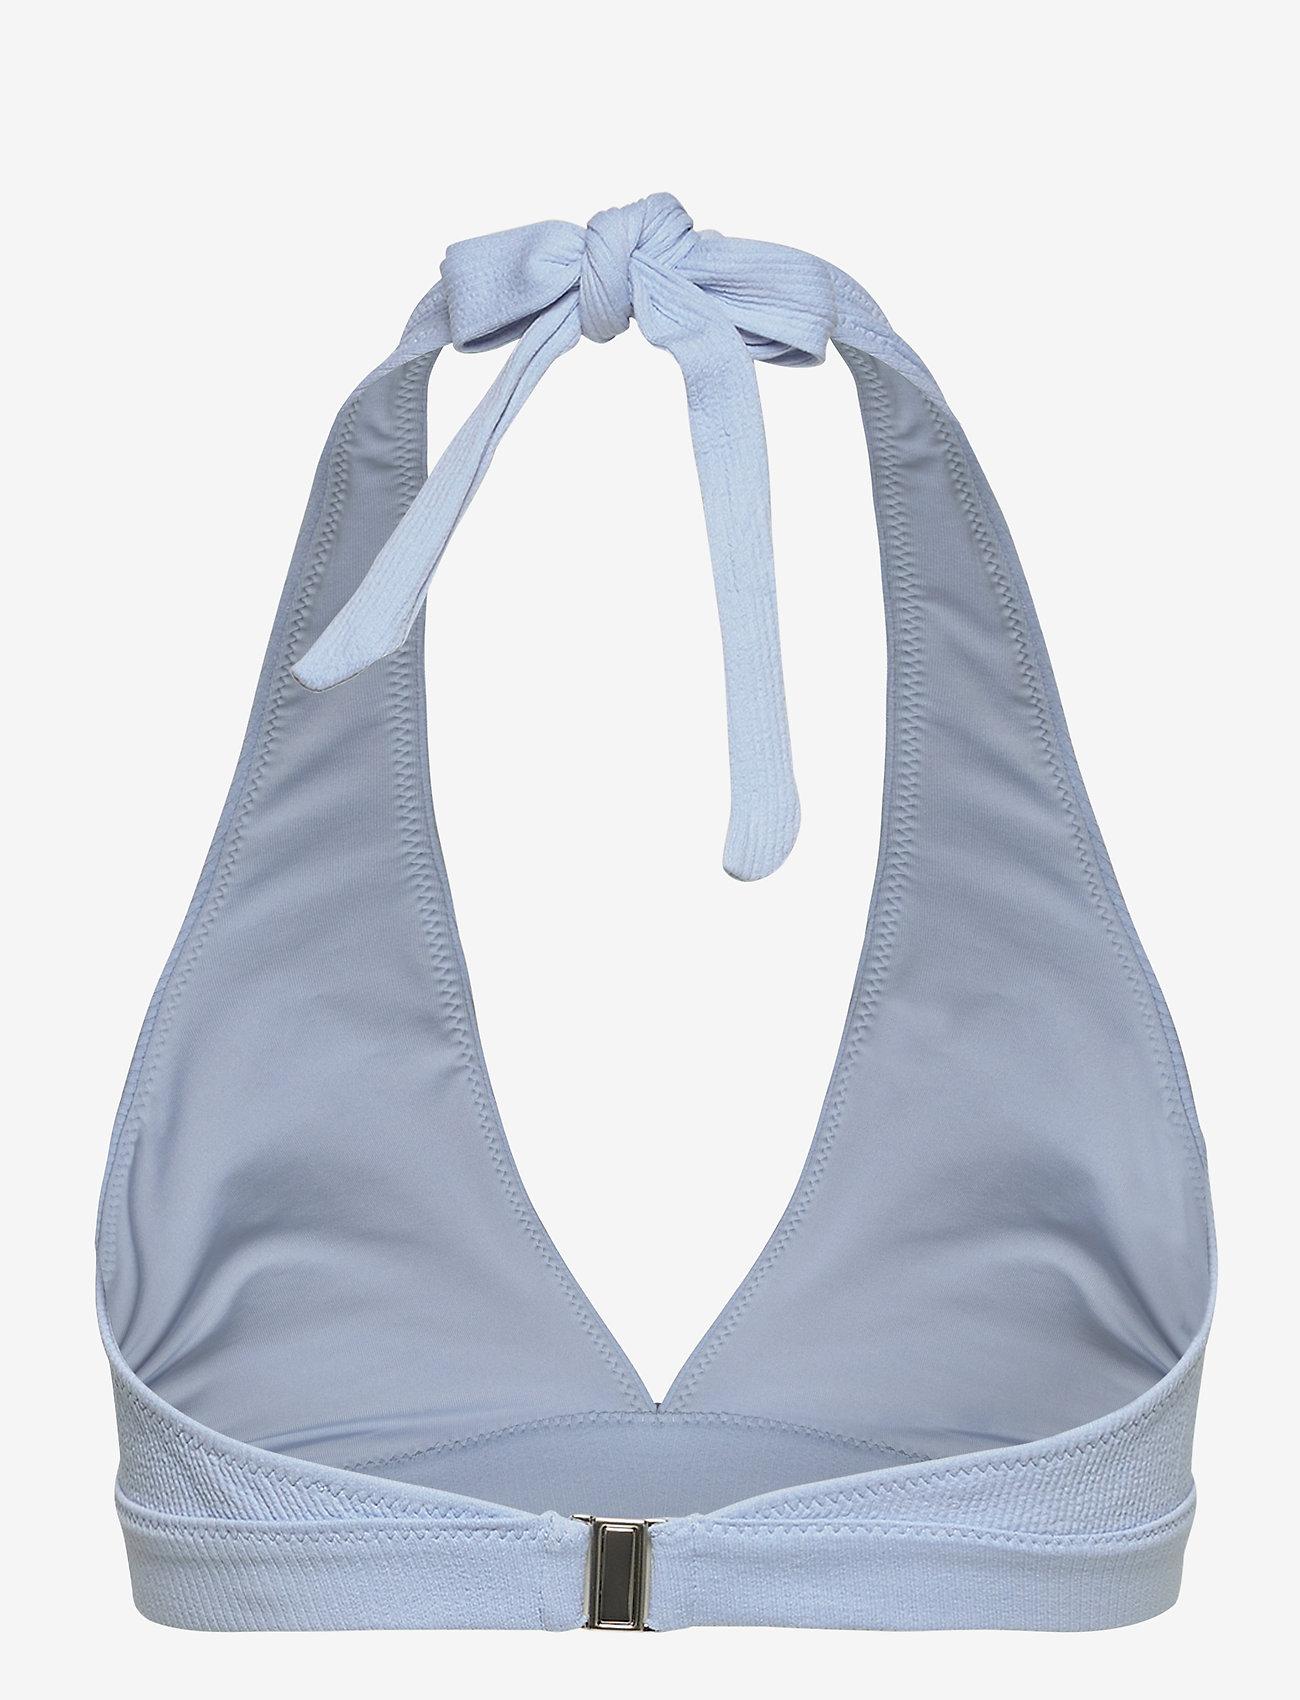 Ganni - Recycled Textured - bikini overdele - chambray blue - 1